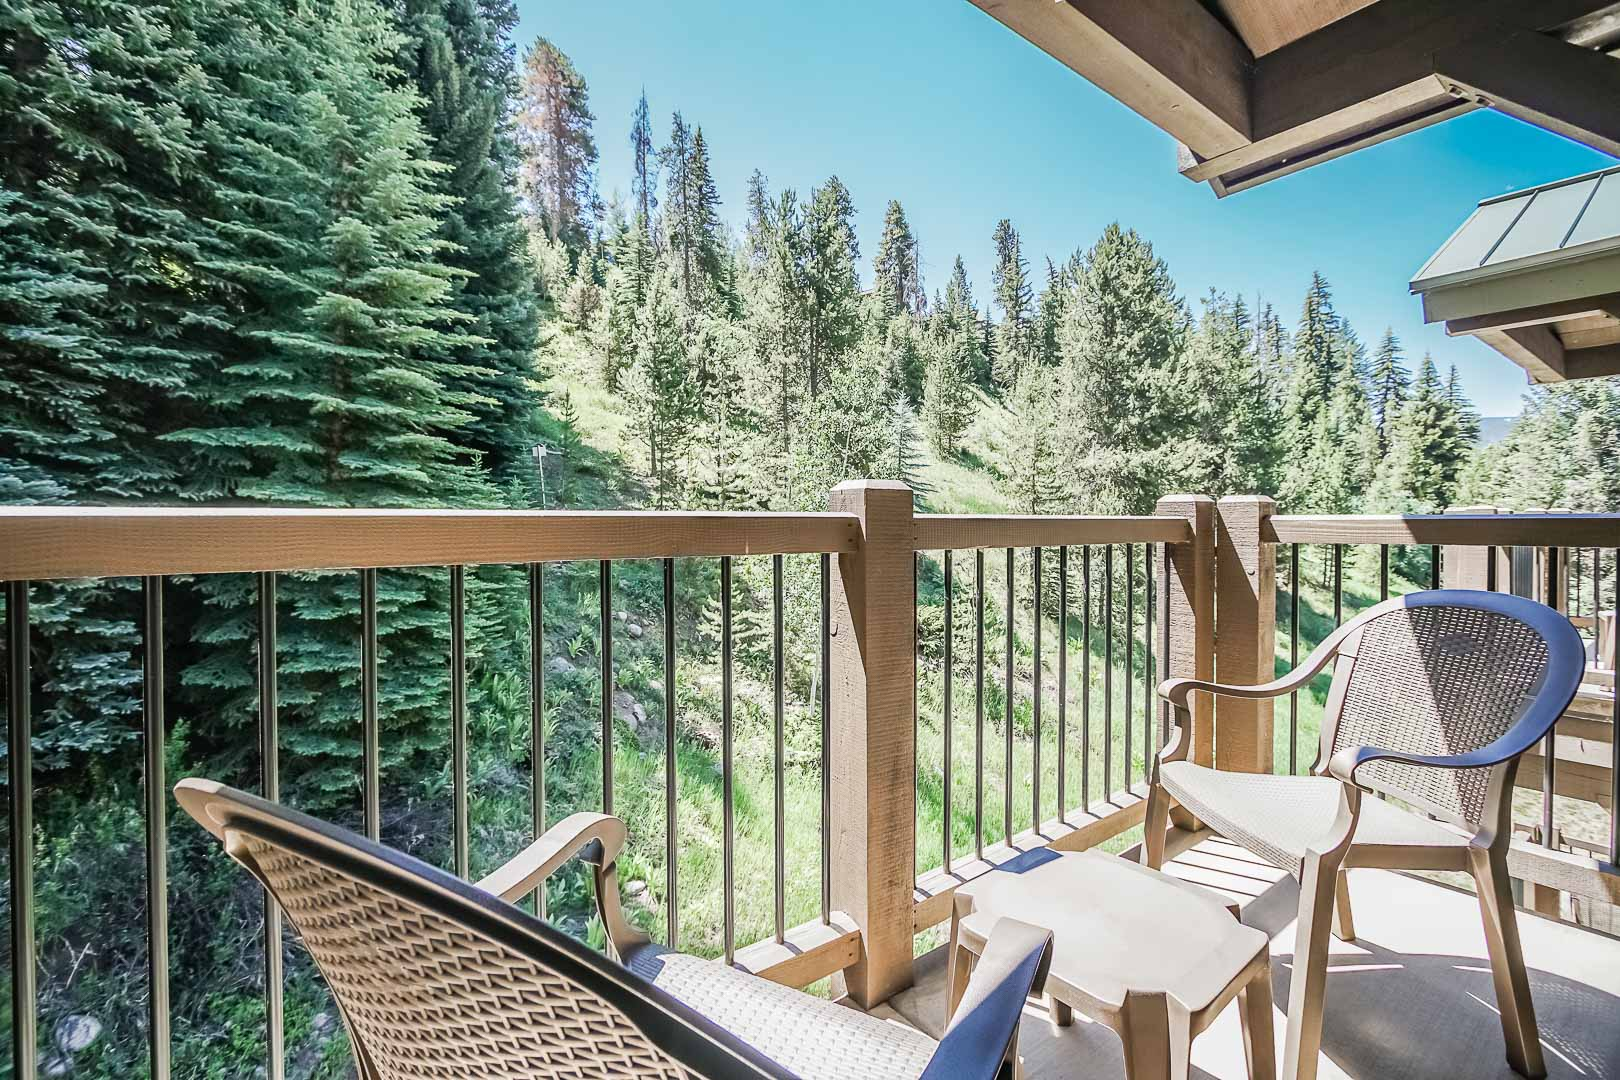 A breathtaking balcony view at VRI's Aspen at Streamside in Colorado.